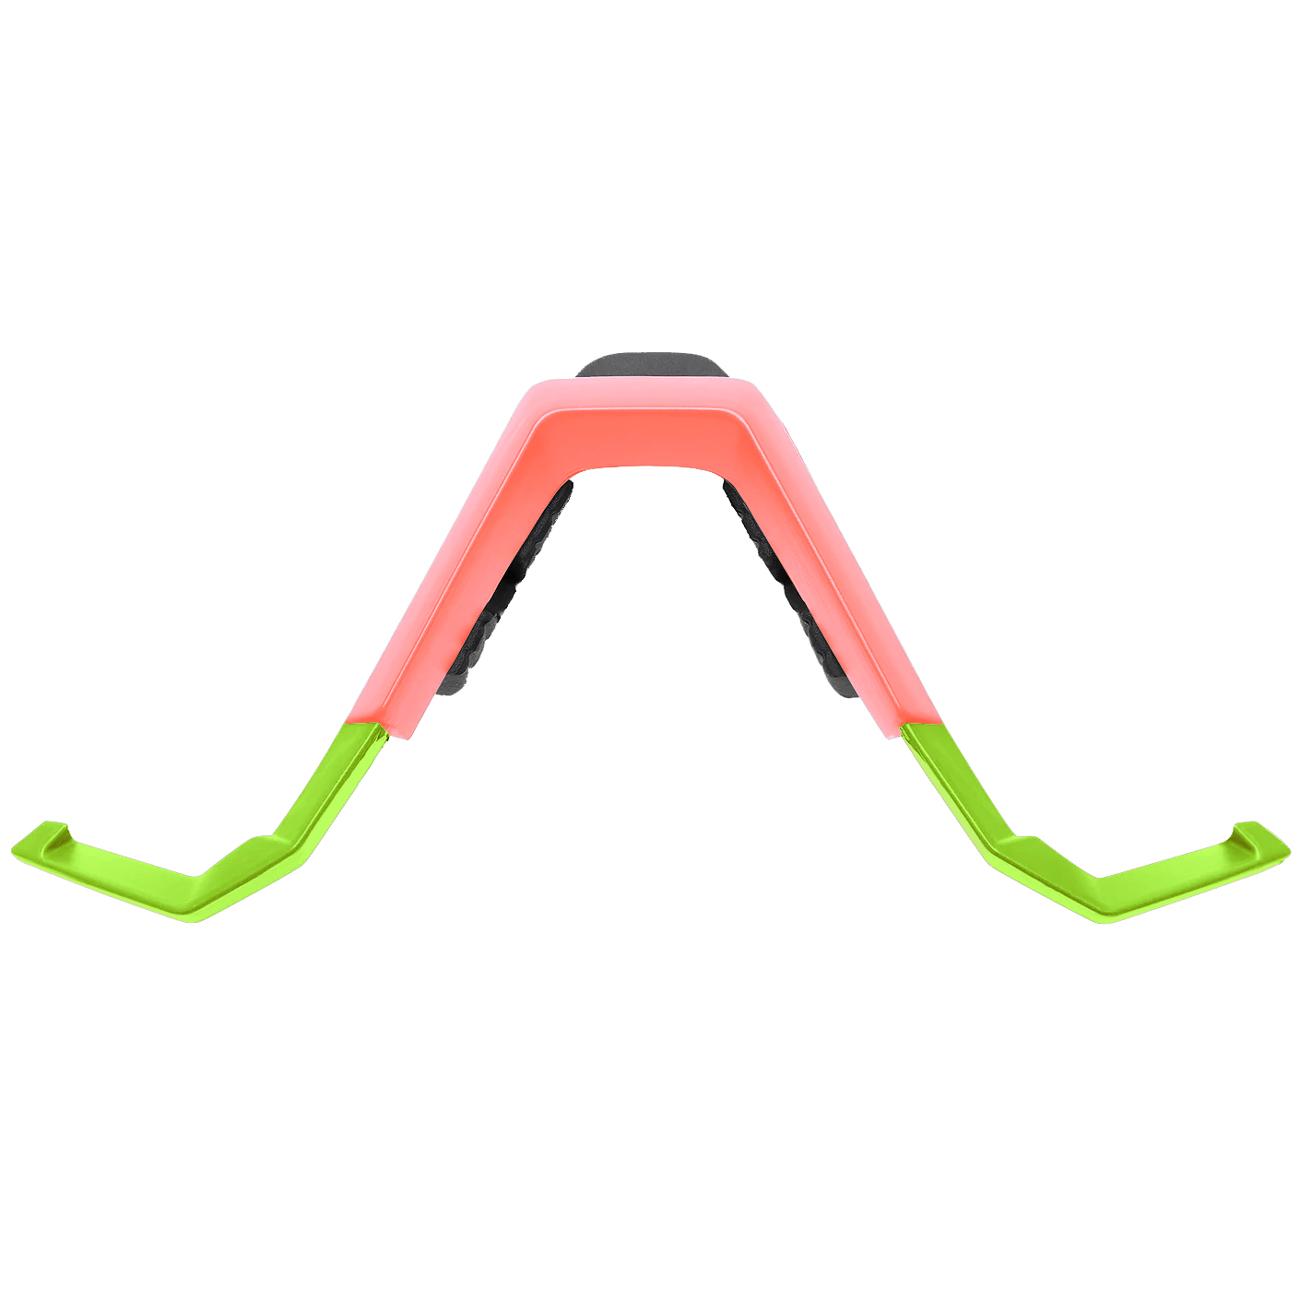 100% Speedcraft/S3 Nose Bridge para Standard/Tall Version - Washed Out Neon Yellow